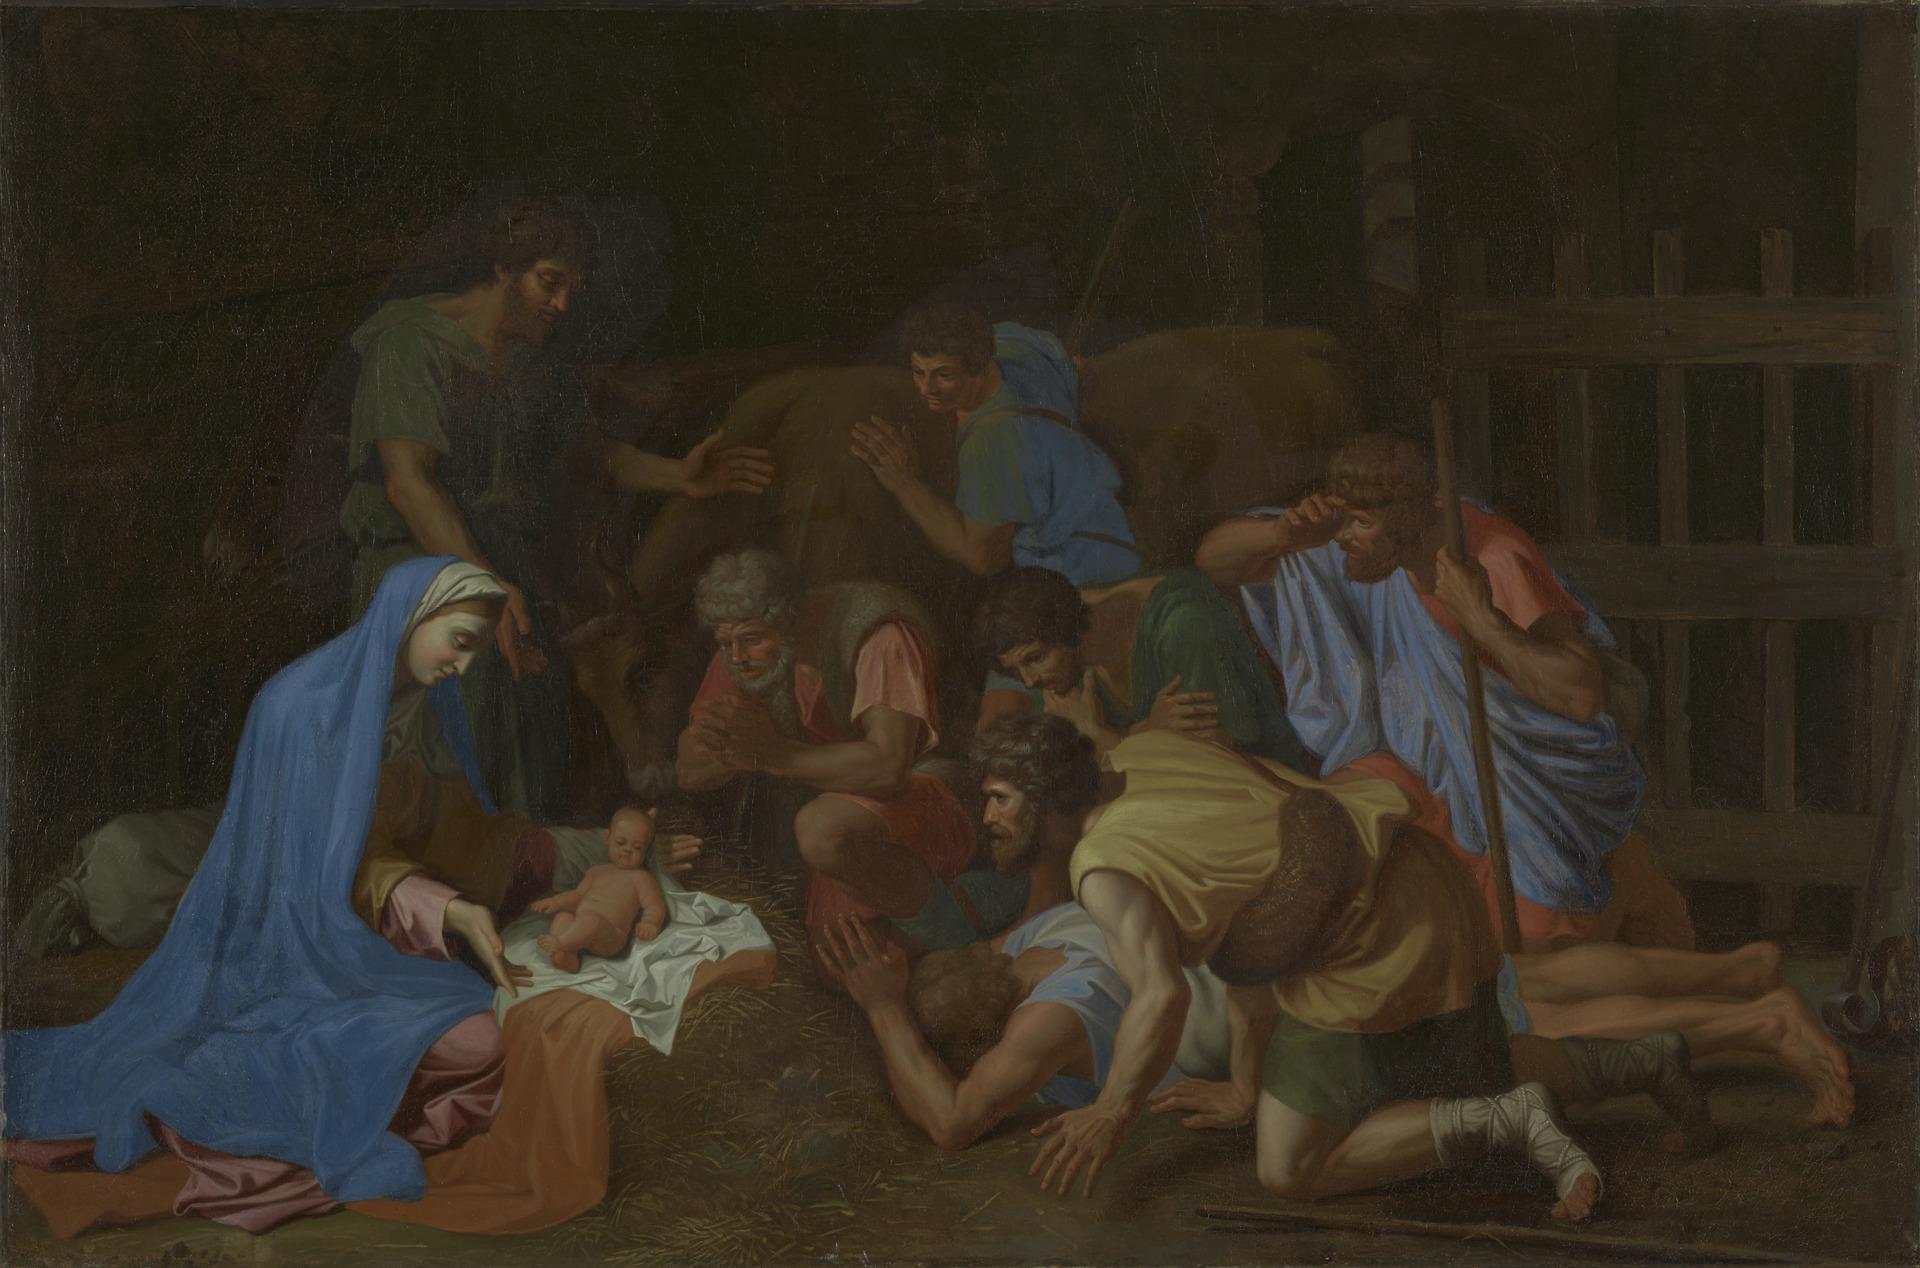 Joseph Helman约瑟夫·赫尔曼画廊